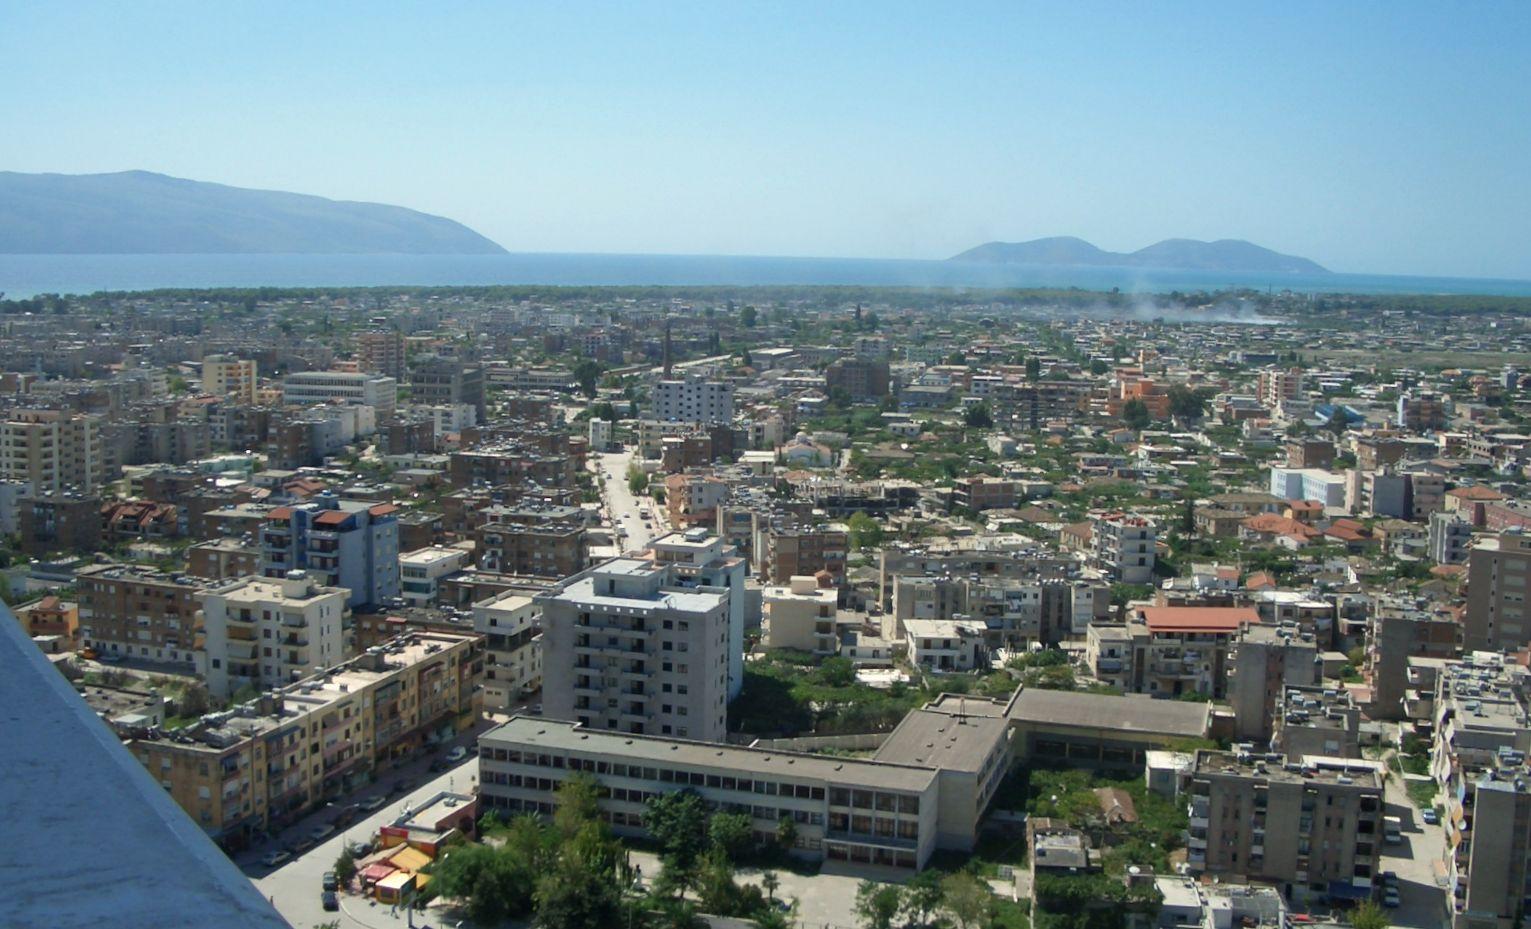 Vlora Albania  City pictures : VON VLORA AUS GESEHn